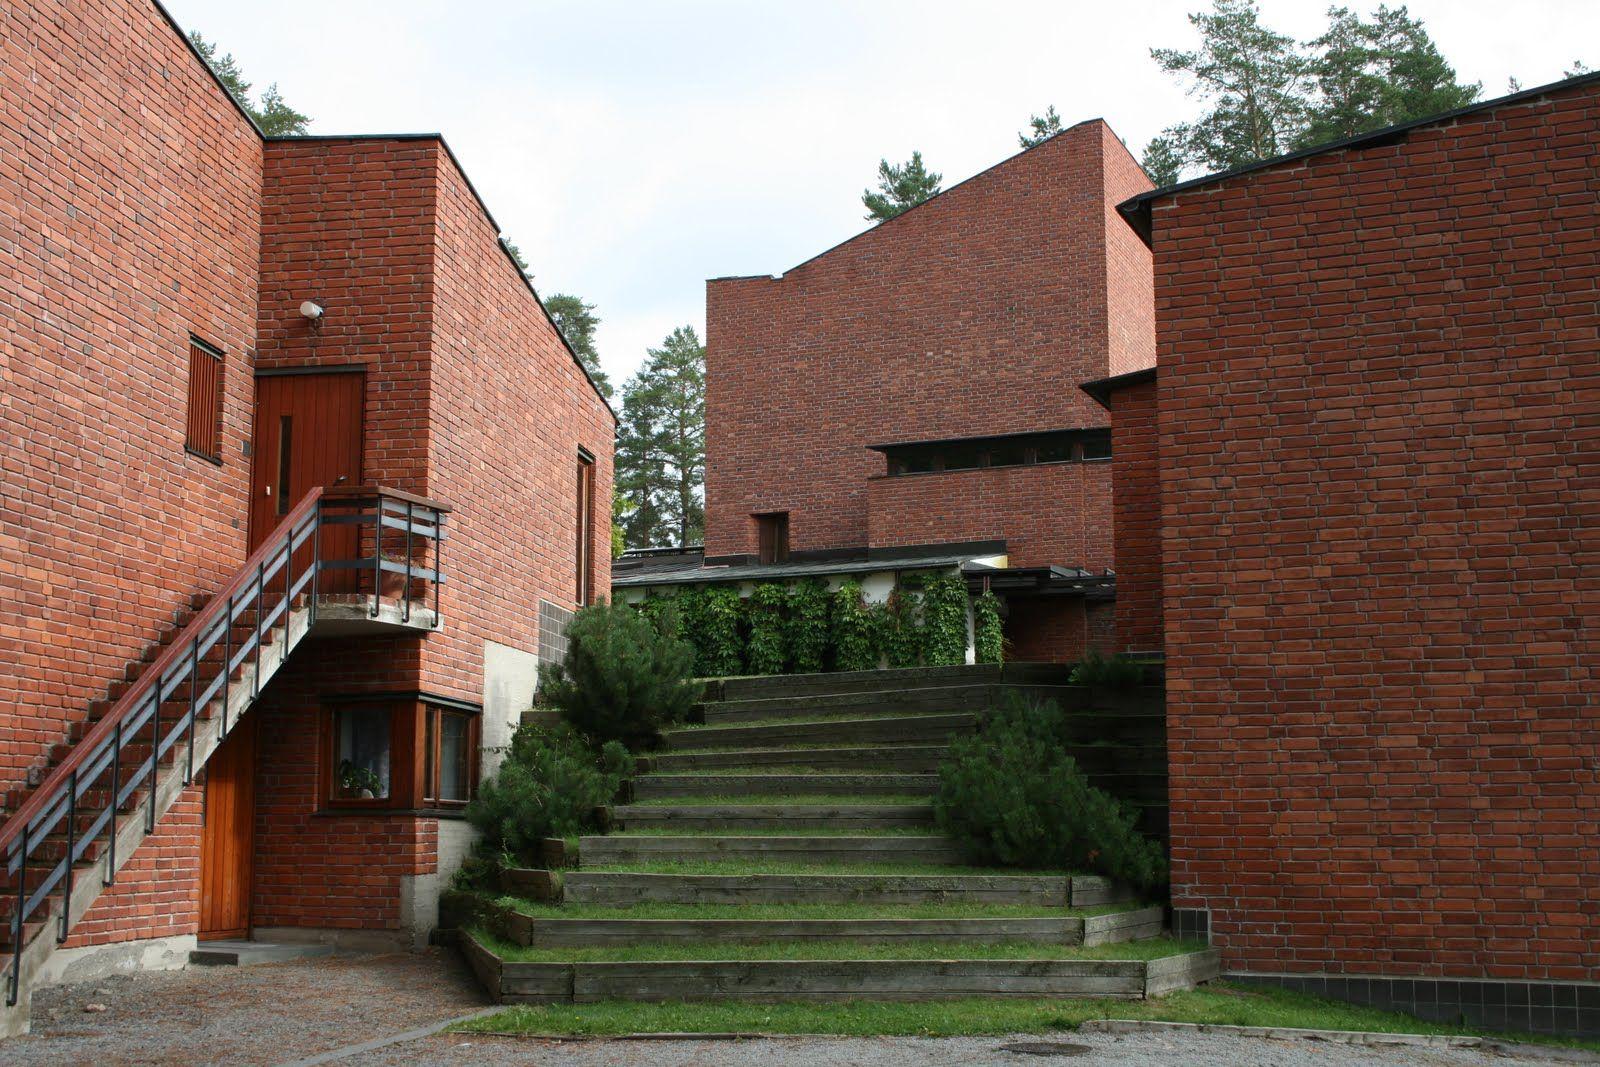 Alvar aalto saynatsalo town hall main access staircase to for The aalto house